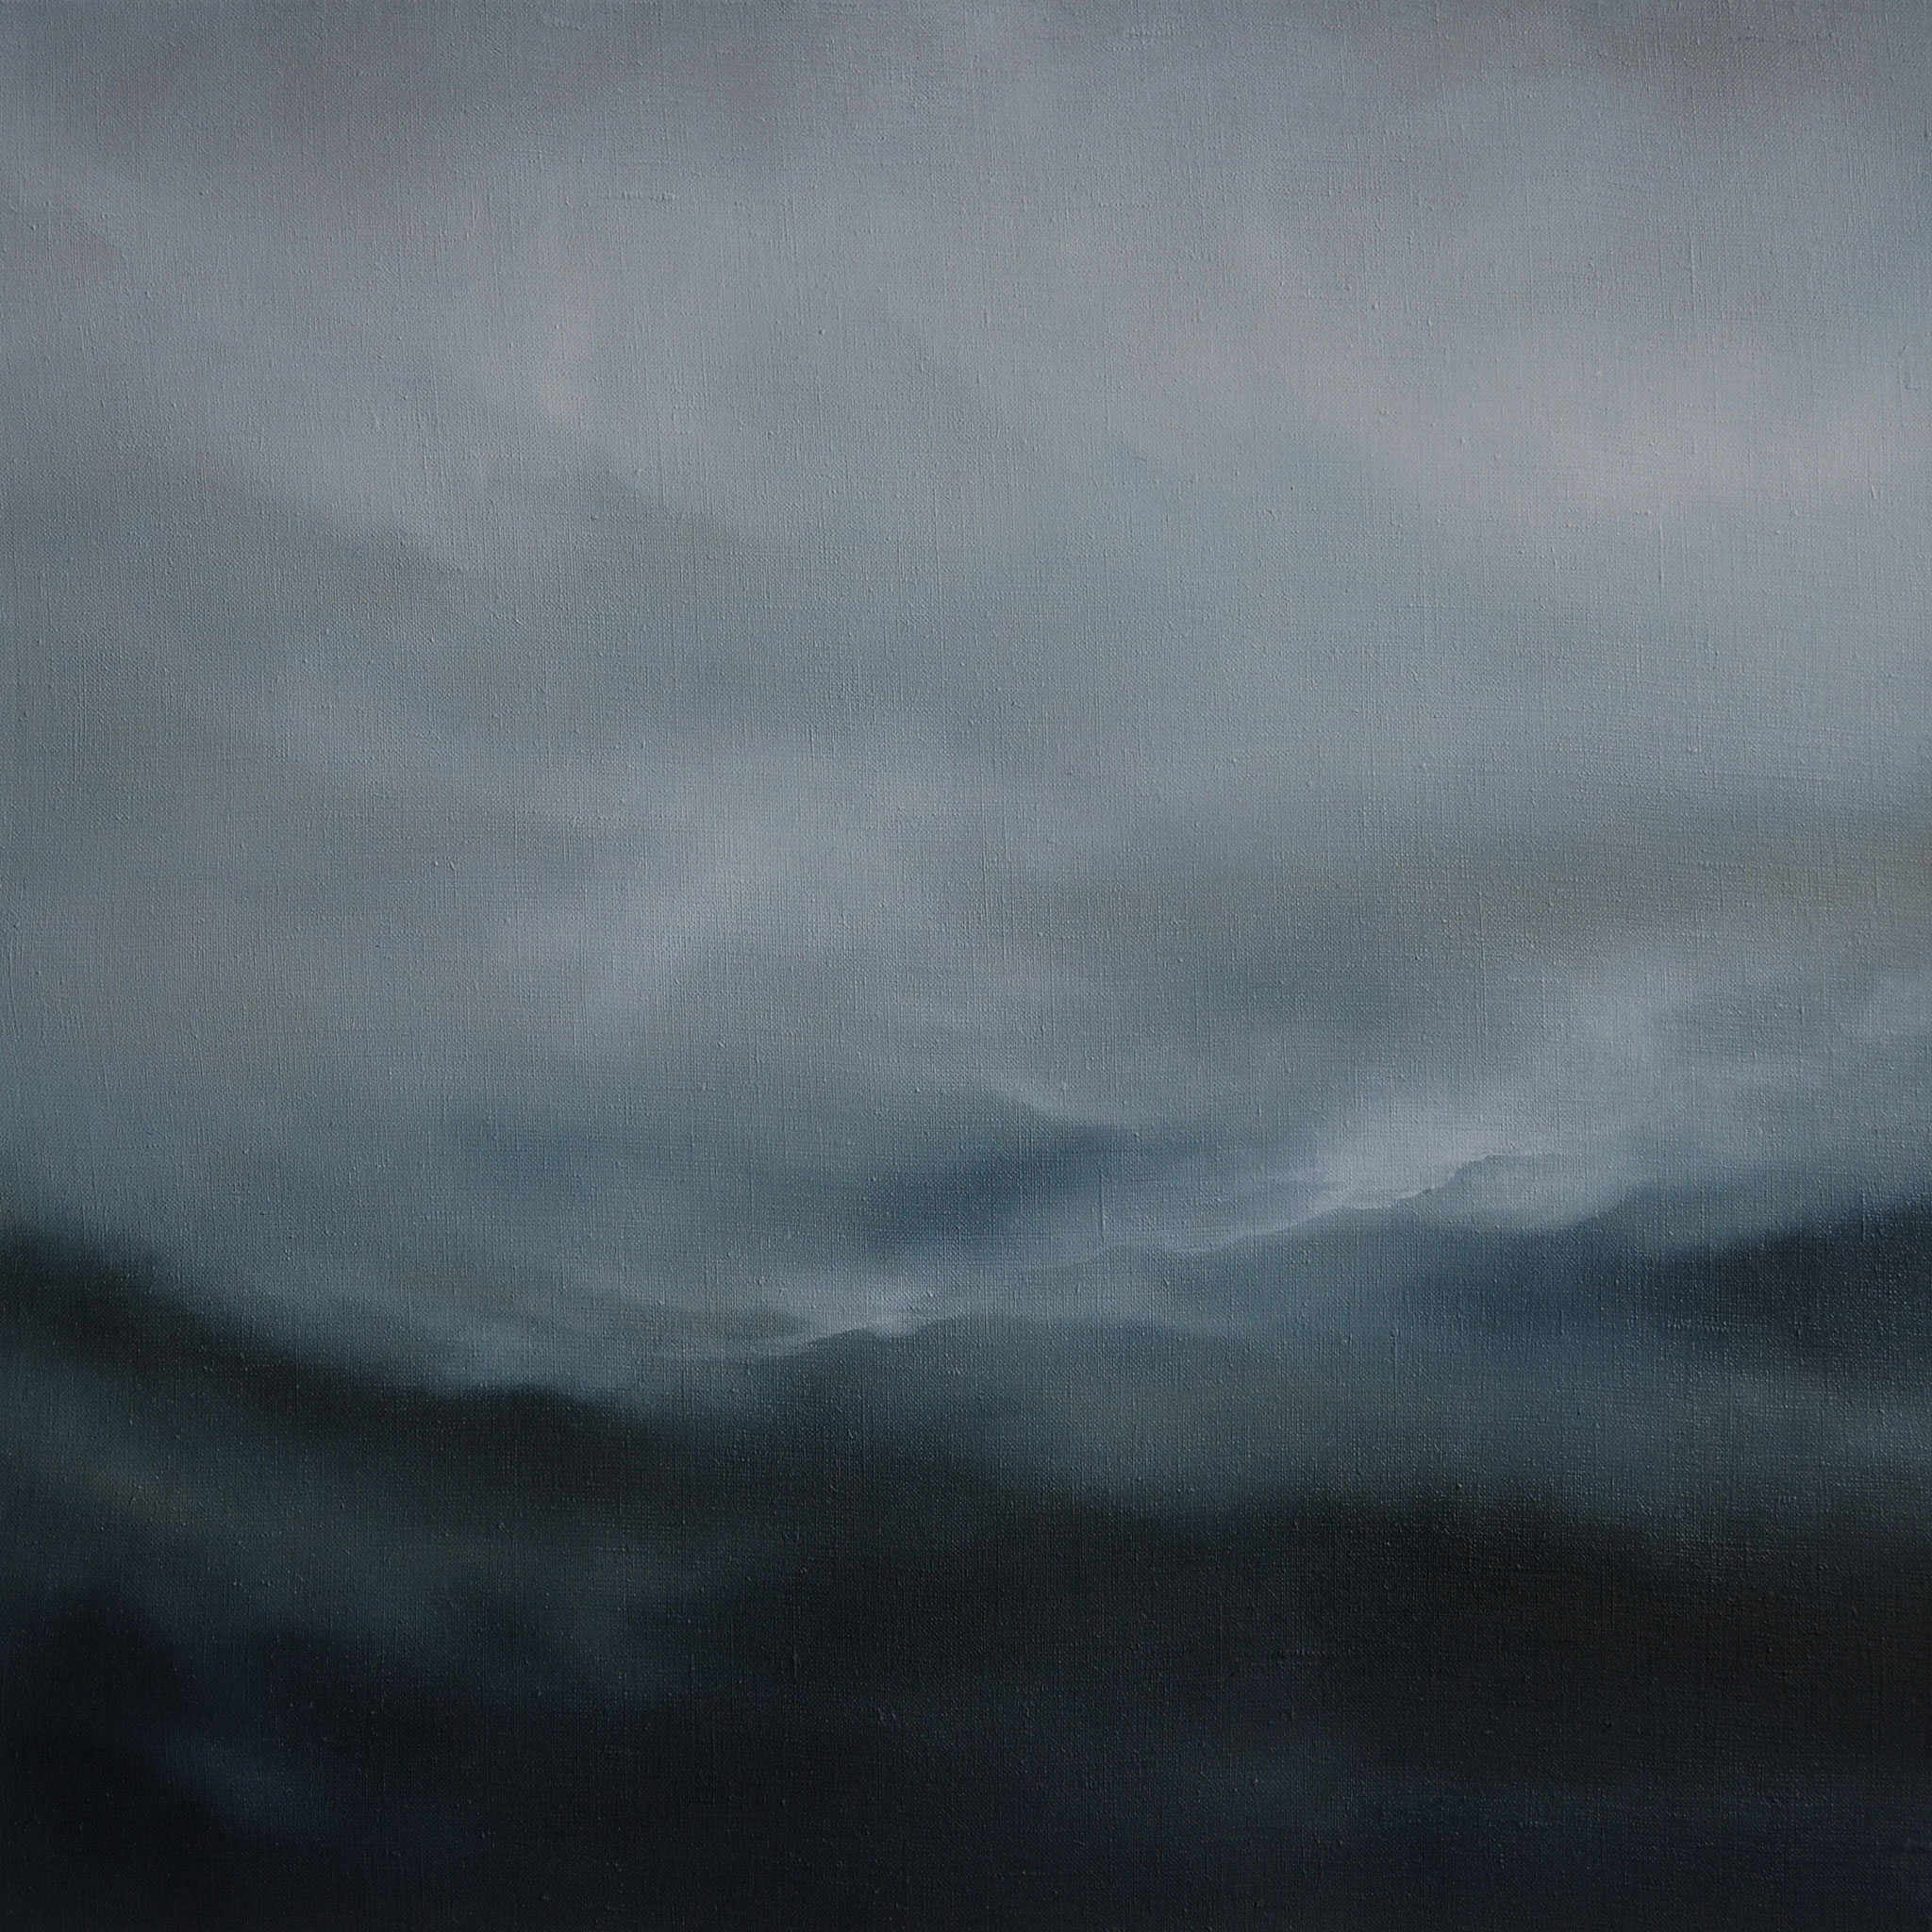 VERHANGEN, 2016, Öl/Lwd., 60 x 60cm